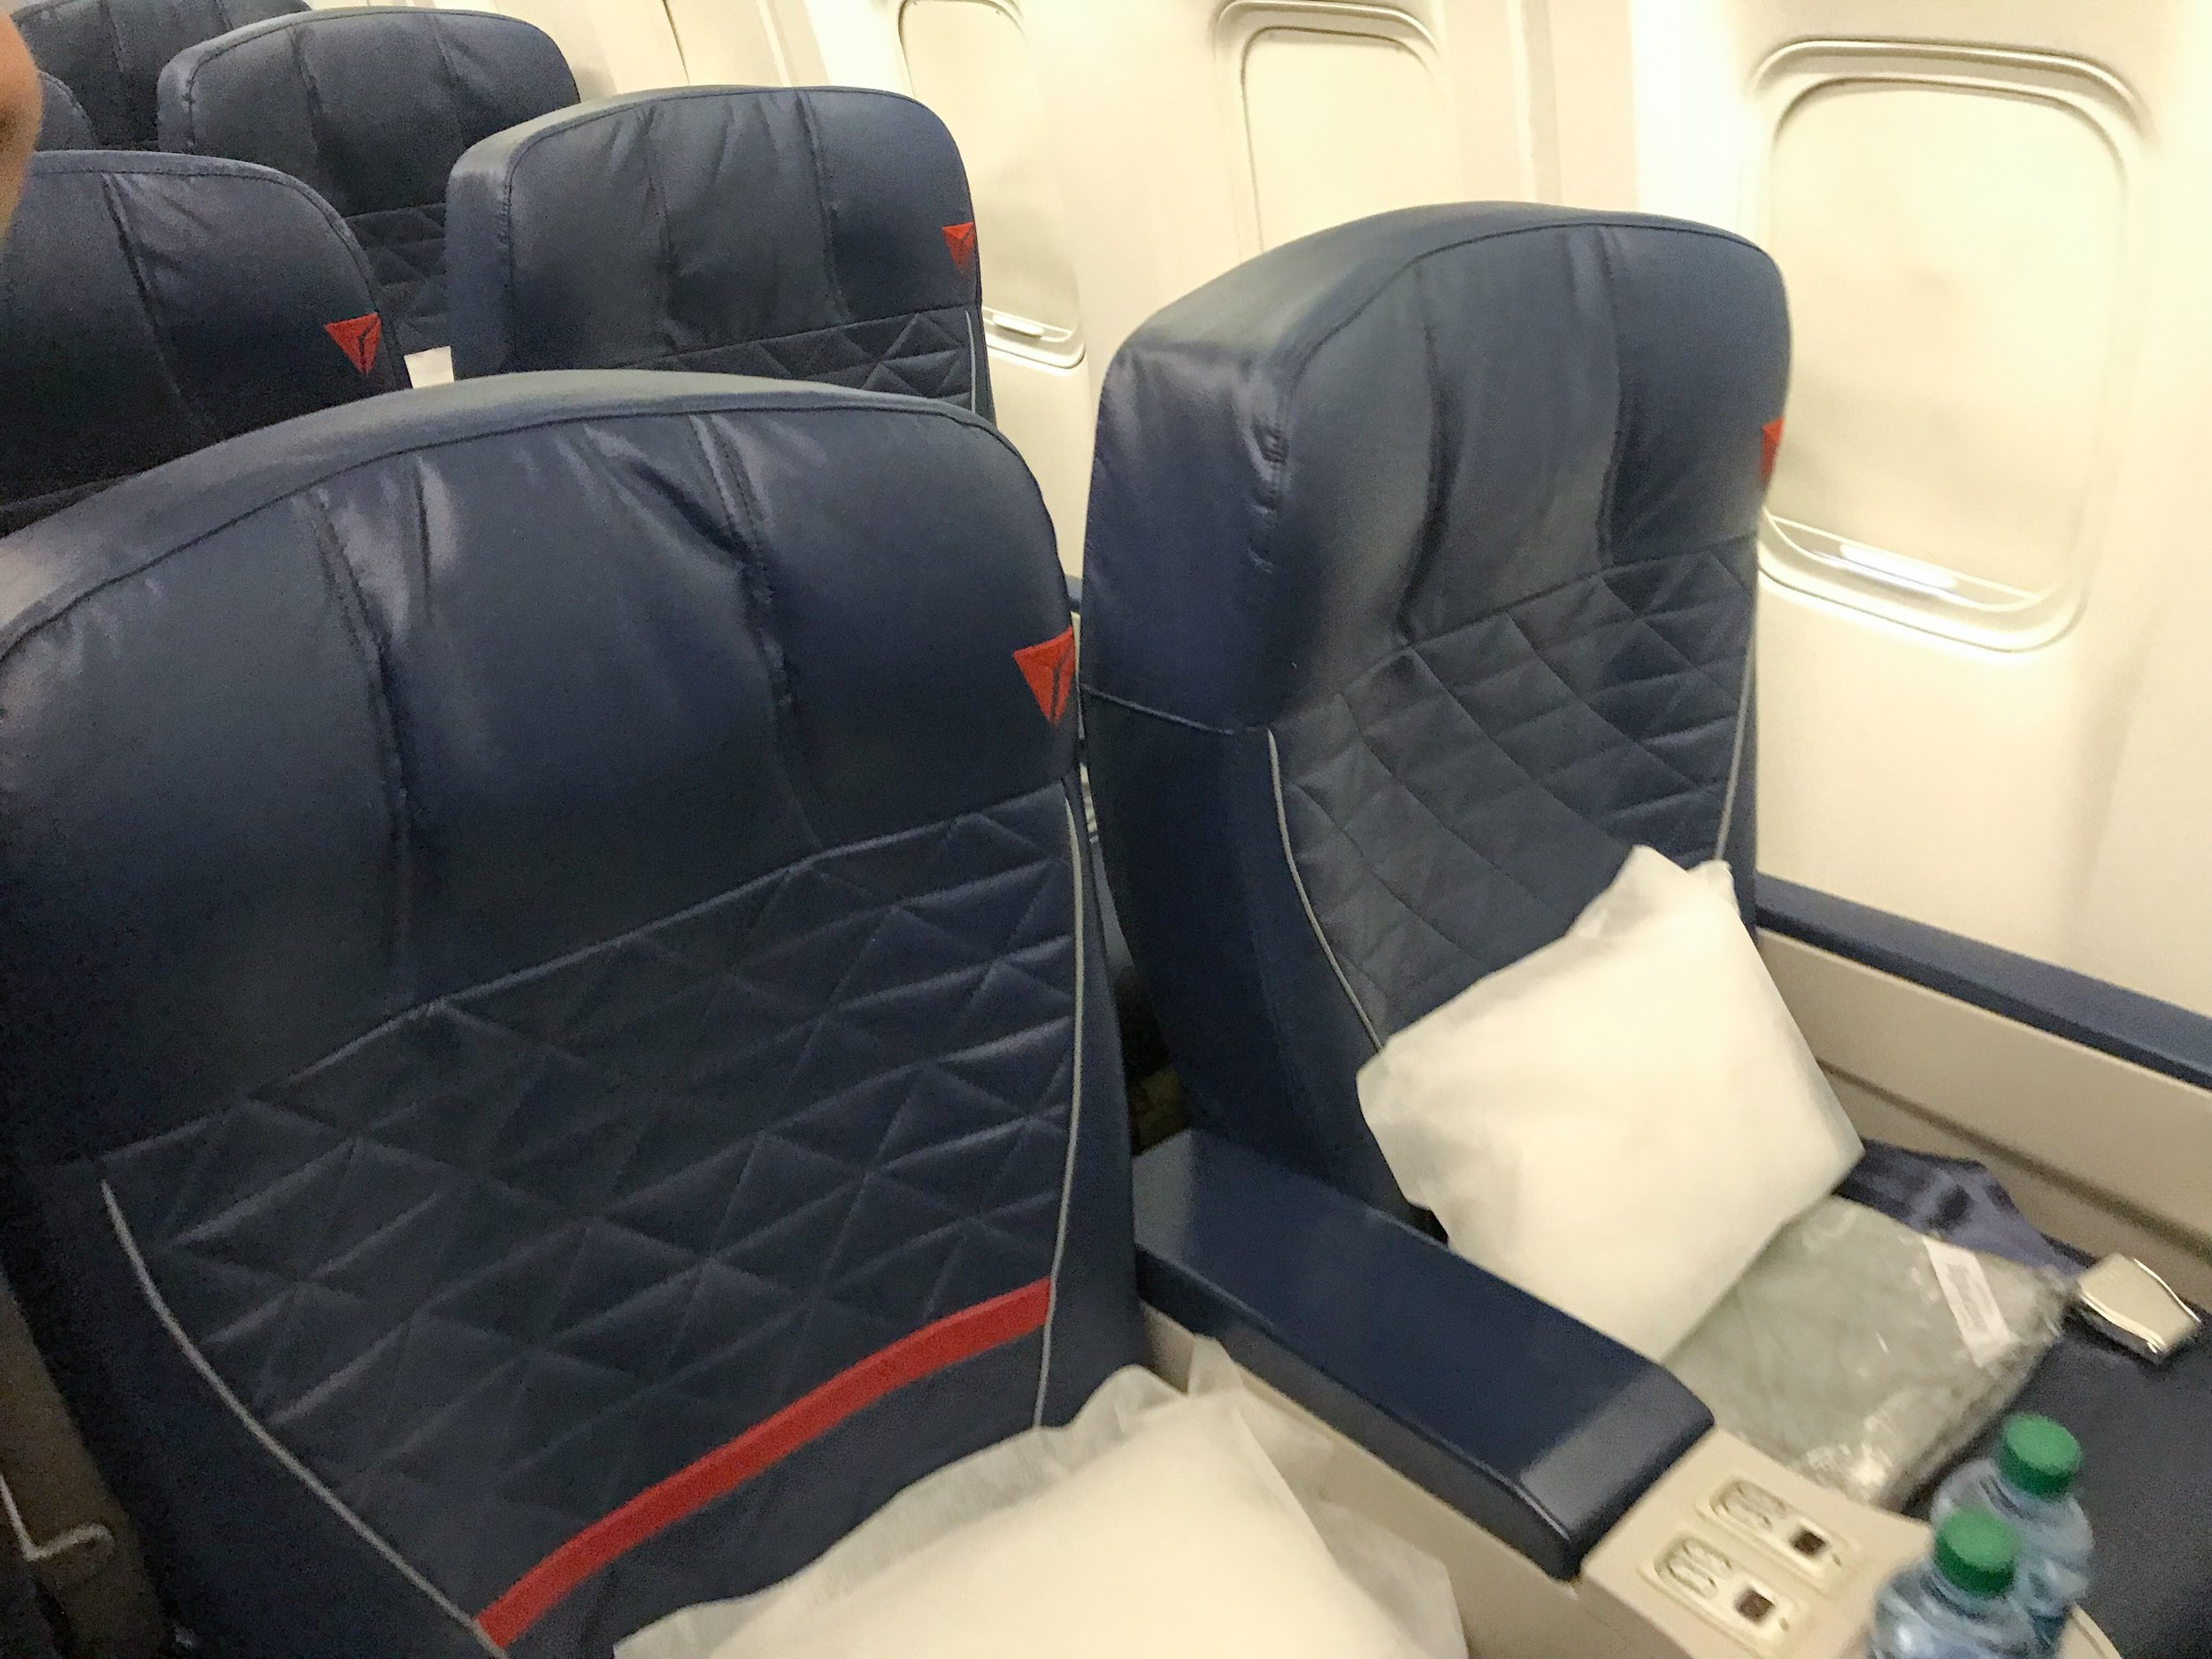 76Q - First Class: 30 SeatsDelta Comfort+: 35 SeatsMain Cabin: 196 Seats